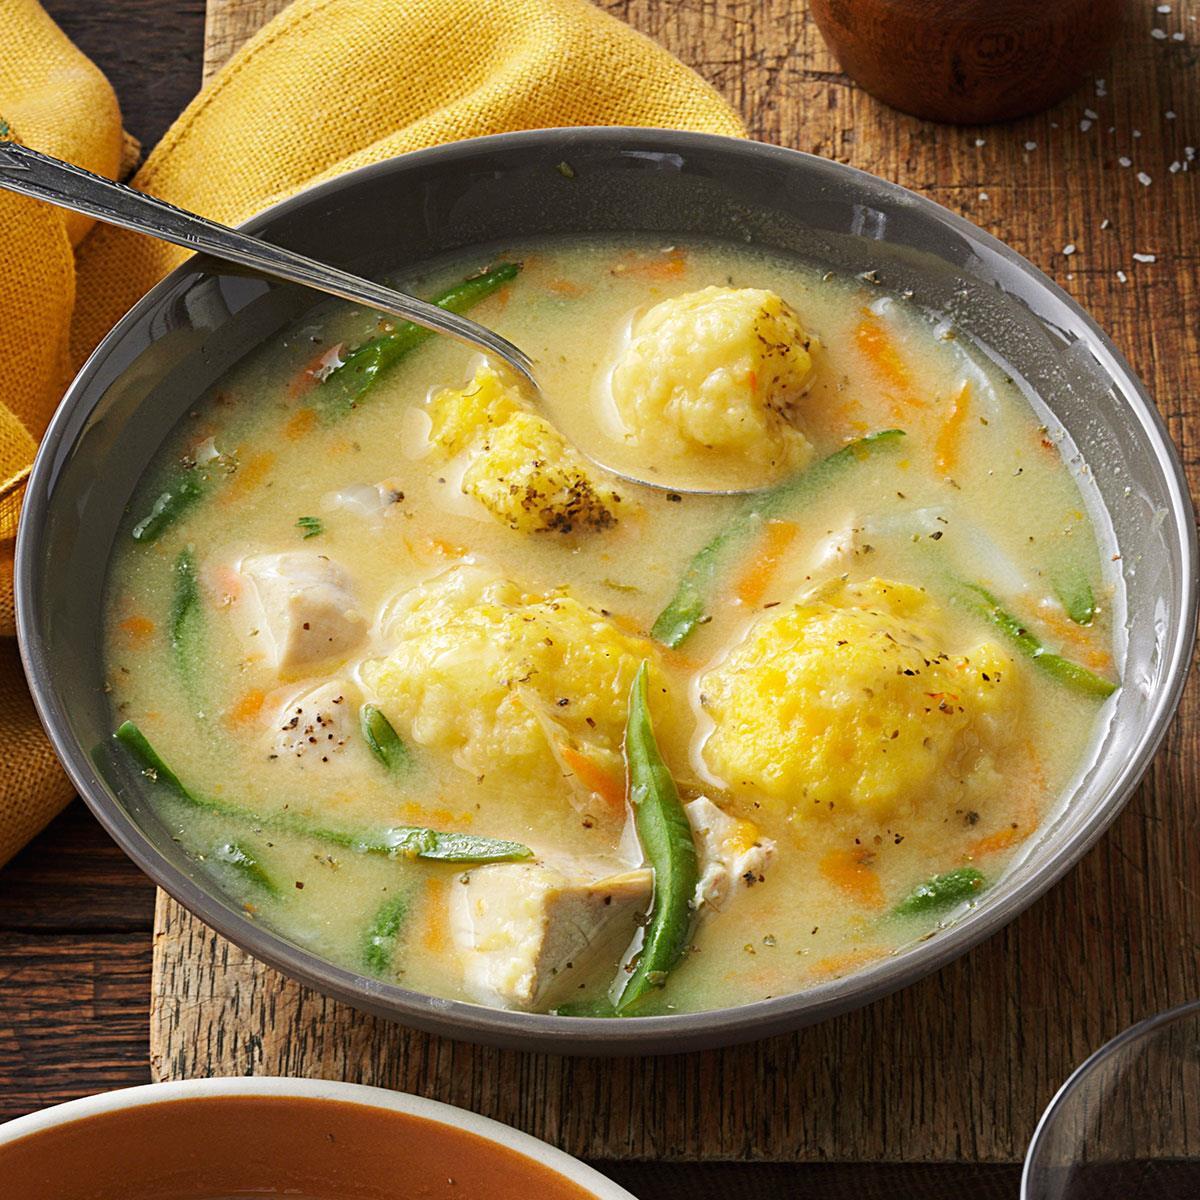 Chicken And Dumplings Soup  Yummy Chicken and Dumpling Soup Recipe